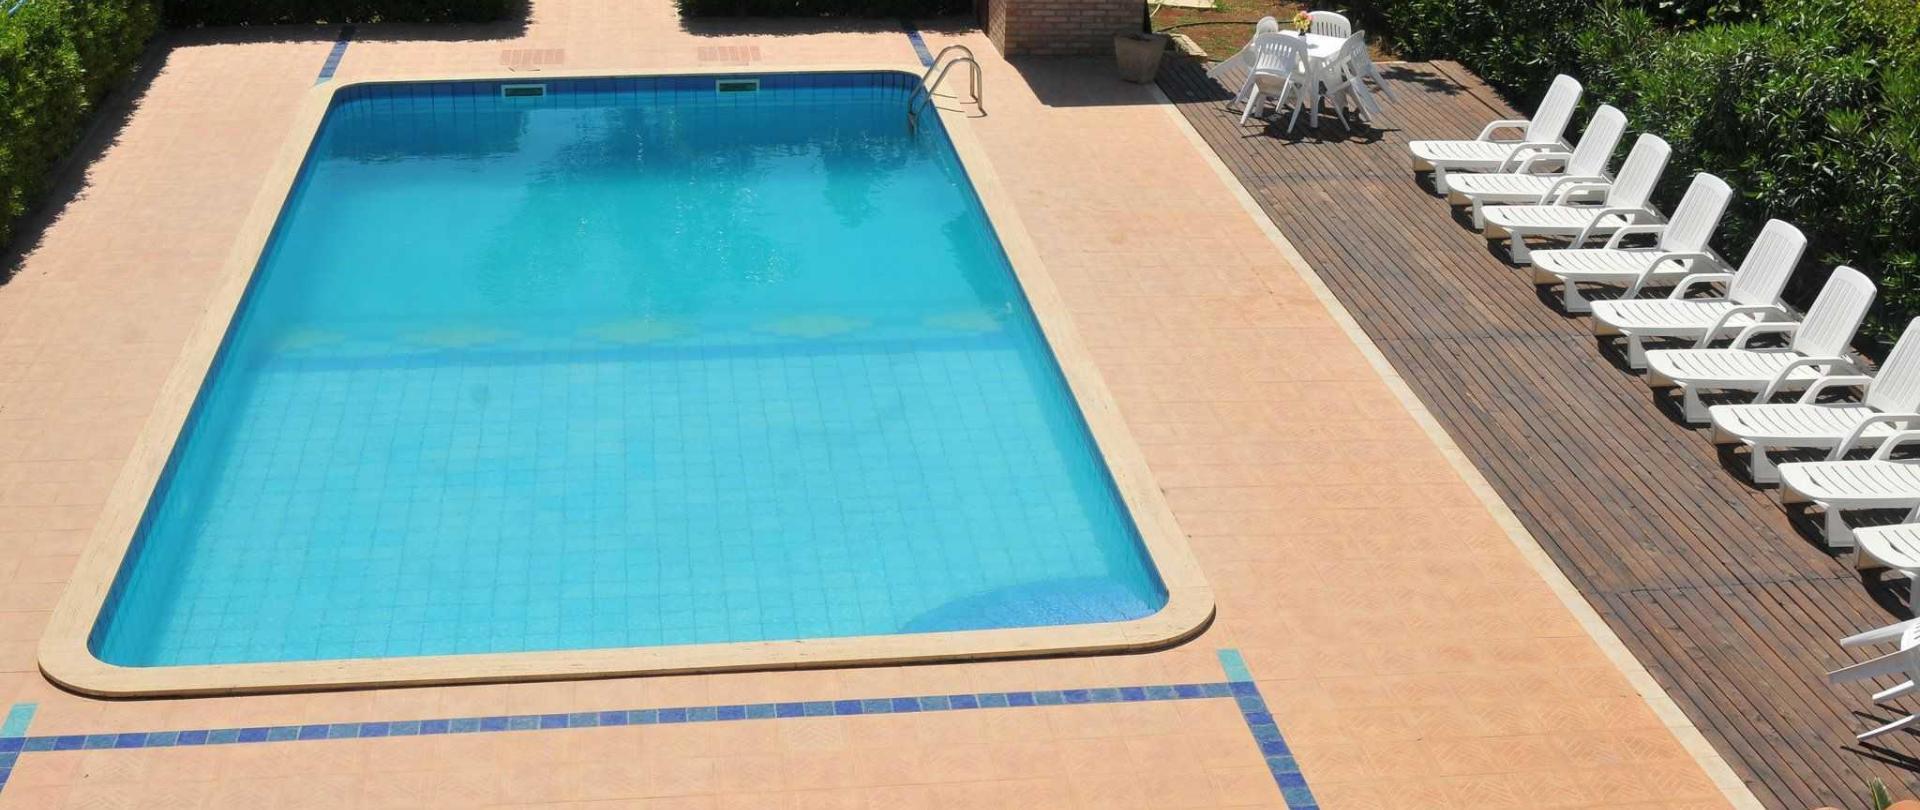 6_resort_noto_il_mandorleto_avola_villa_con_piscina_campagna_siciliana_15.JPG